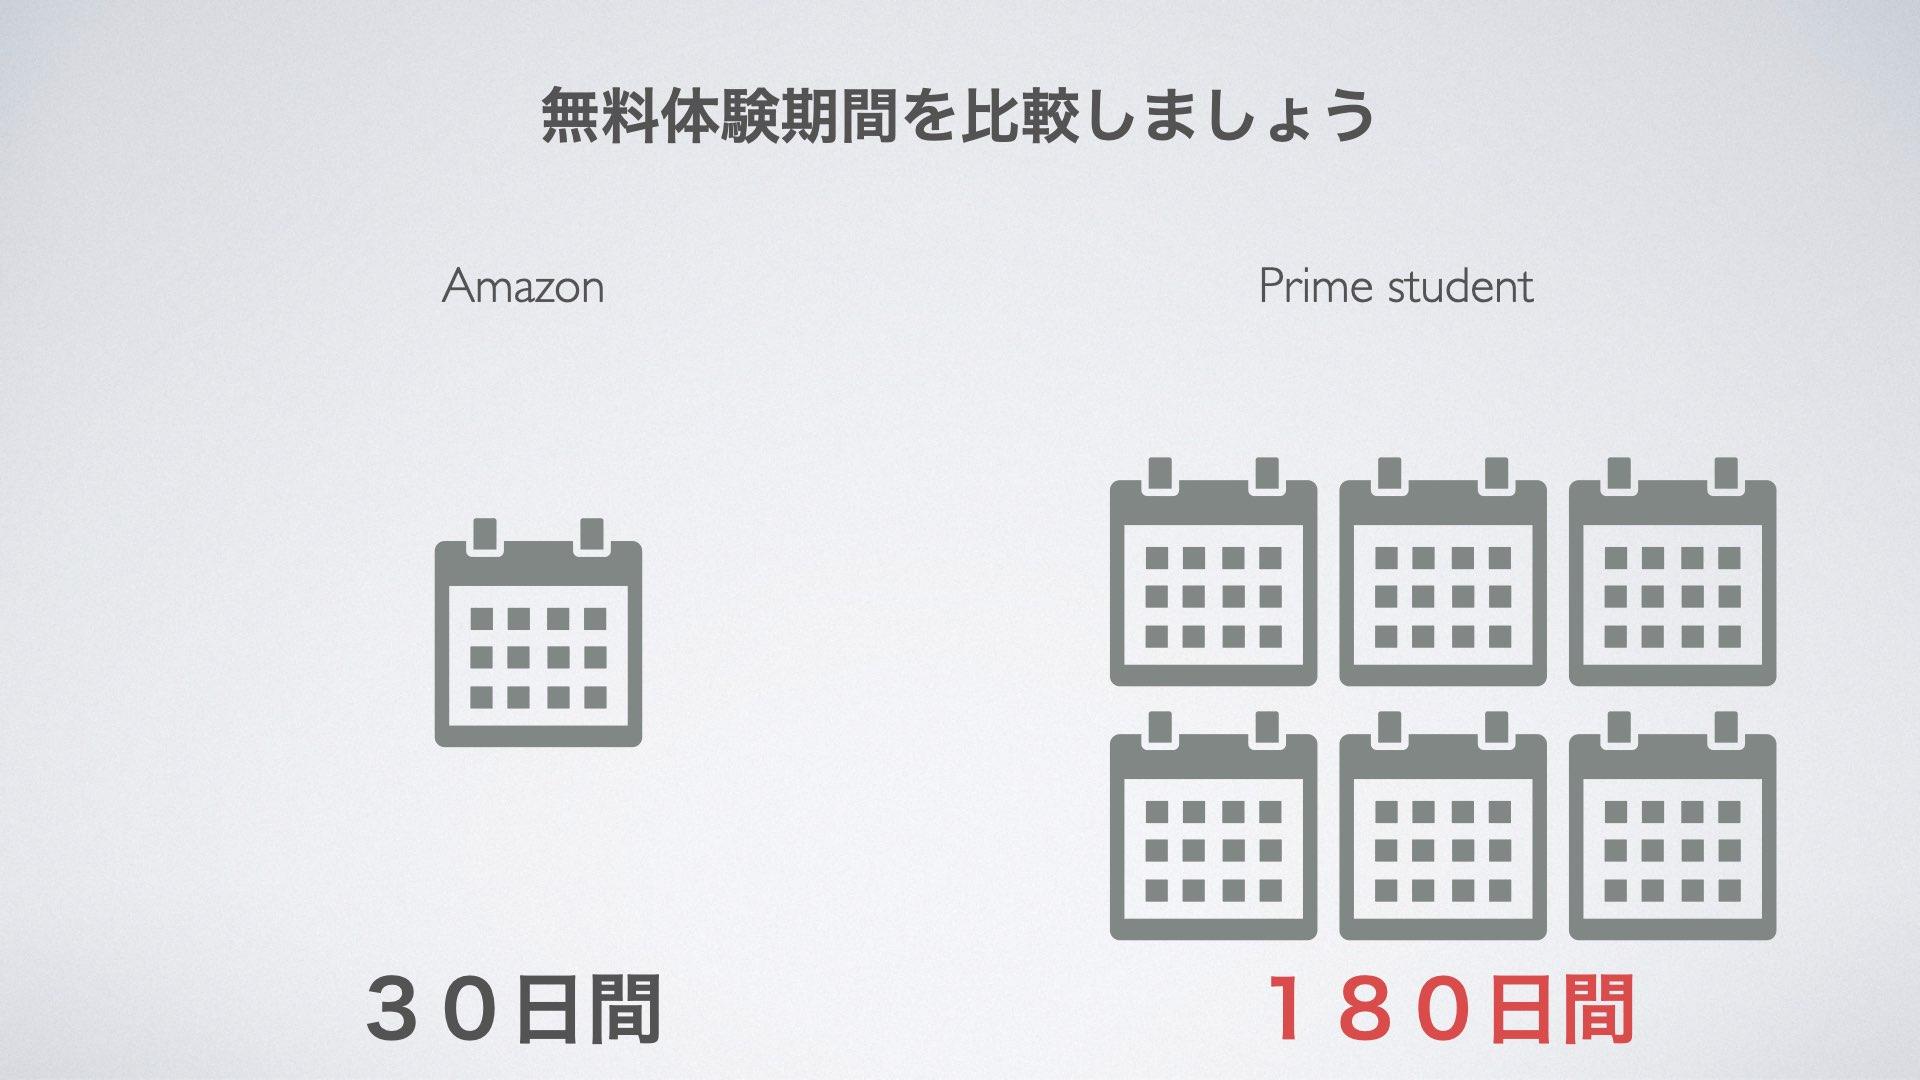 AmazonStudentの無料体験期間はなんと6ヶ月